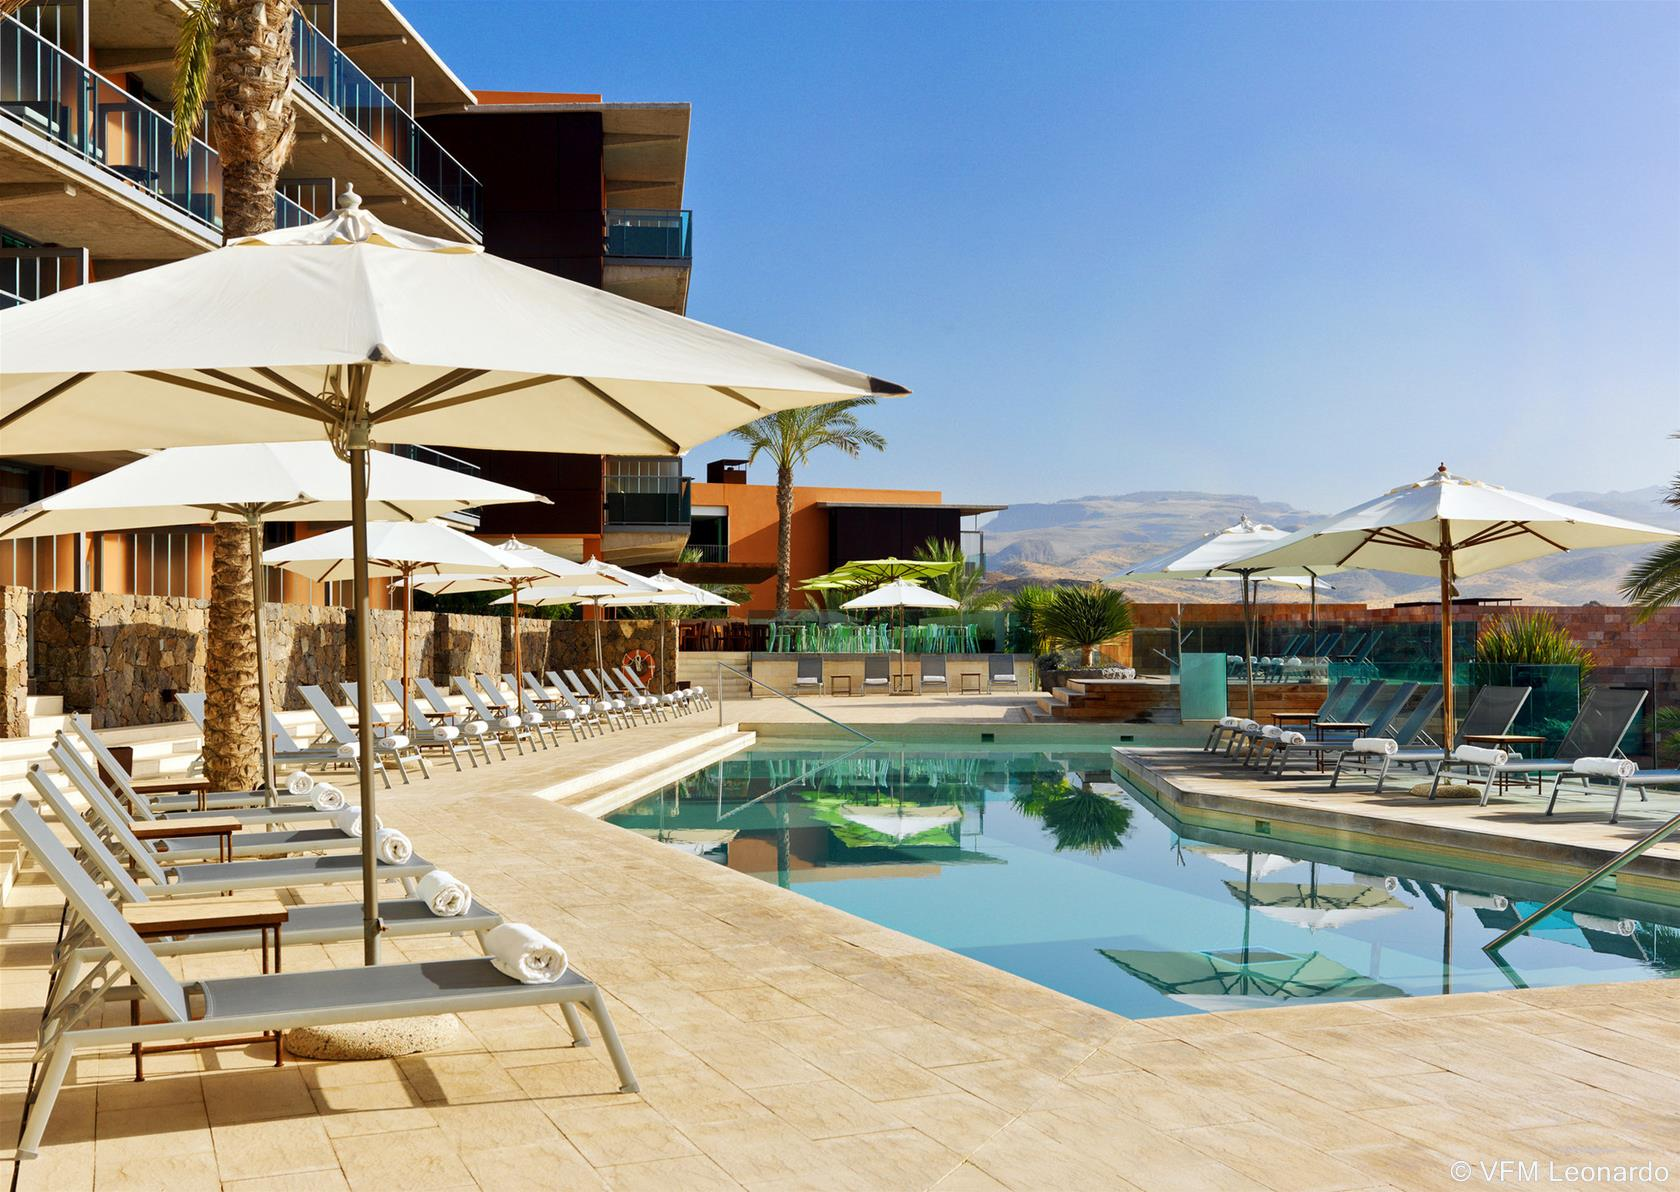 HotelSheraton Salobre Golf